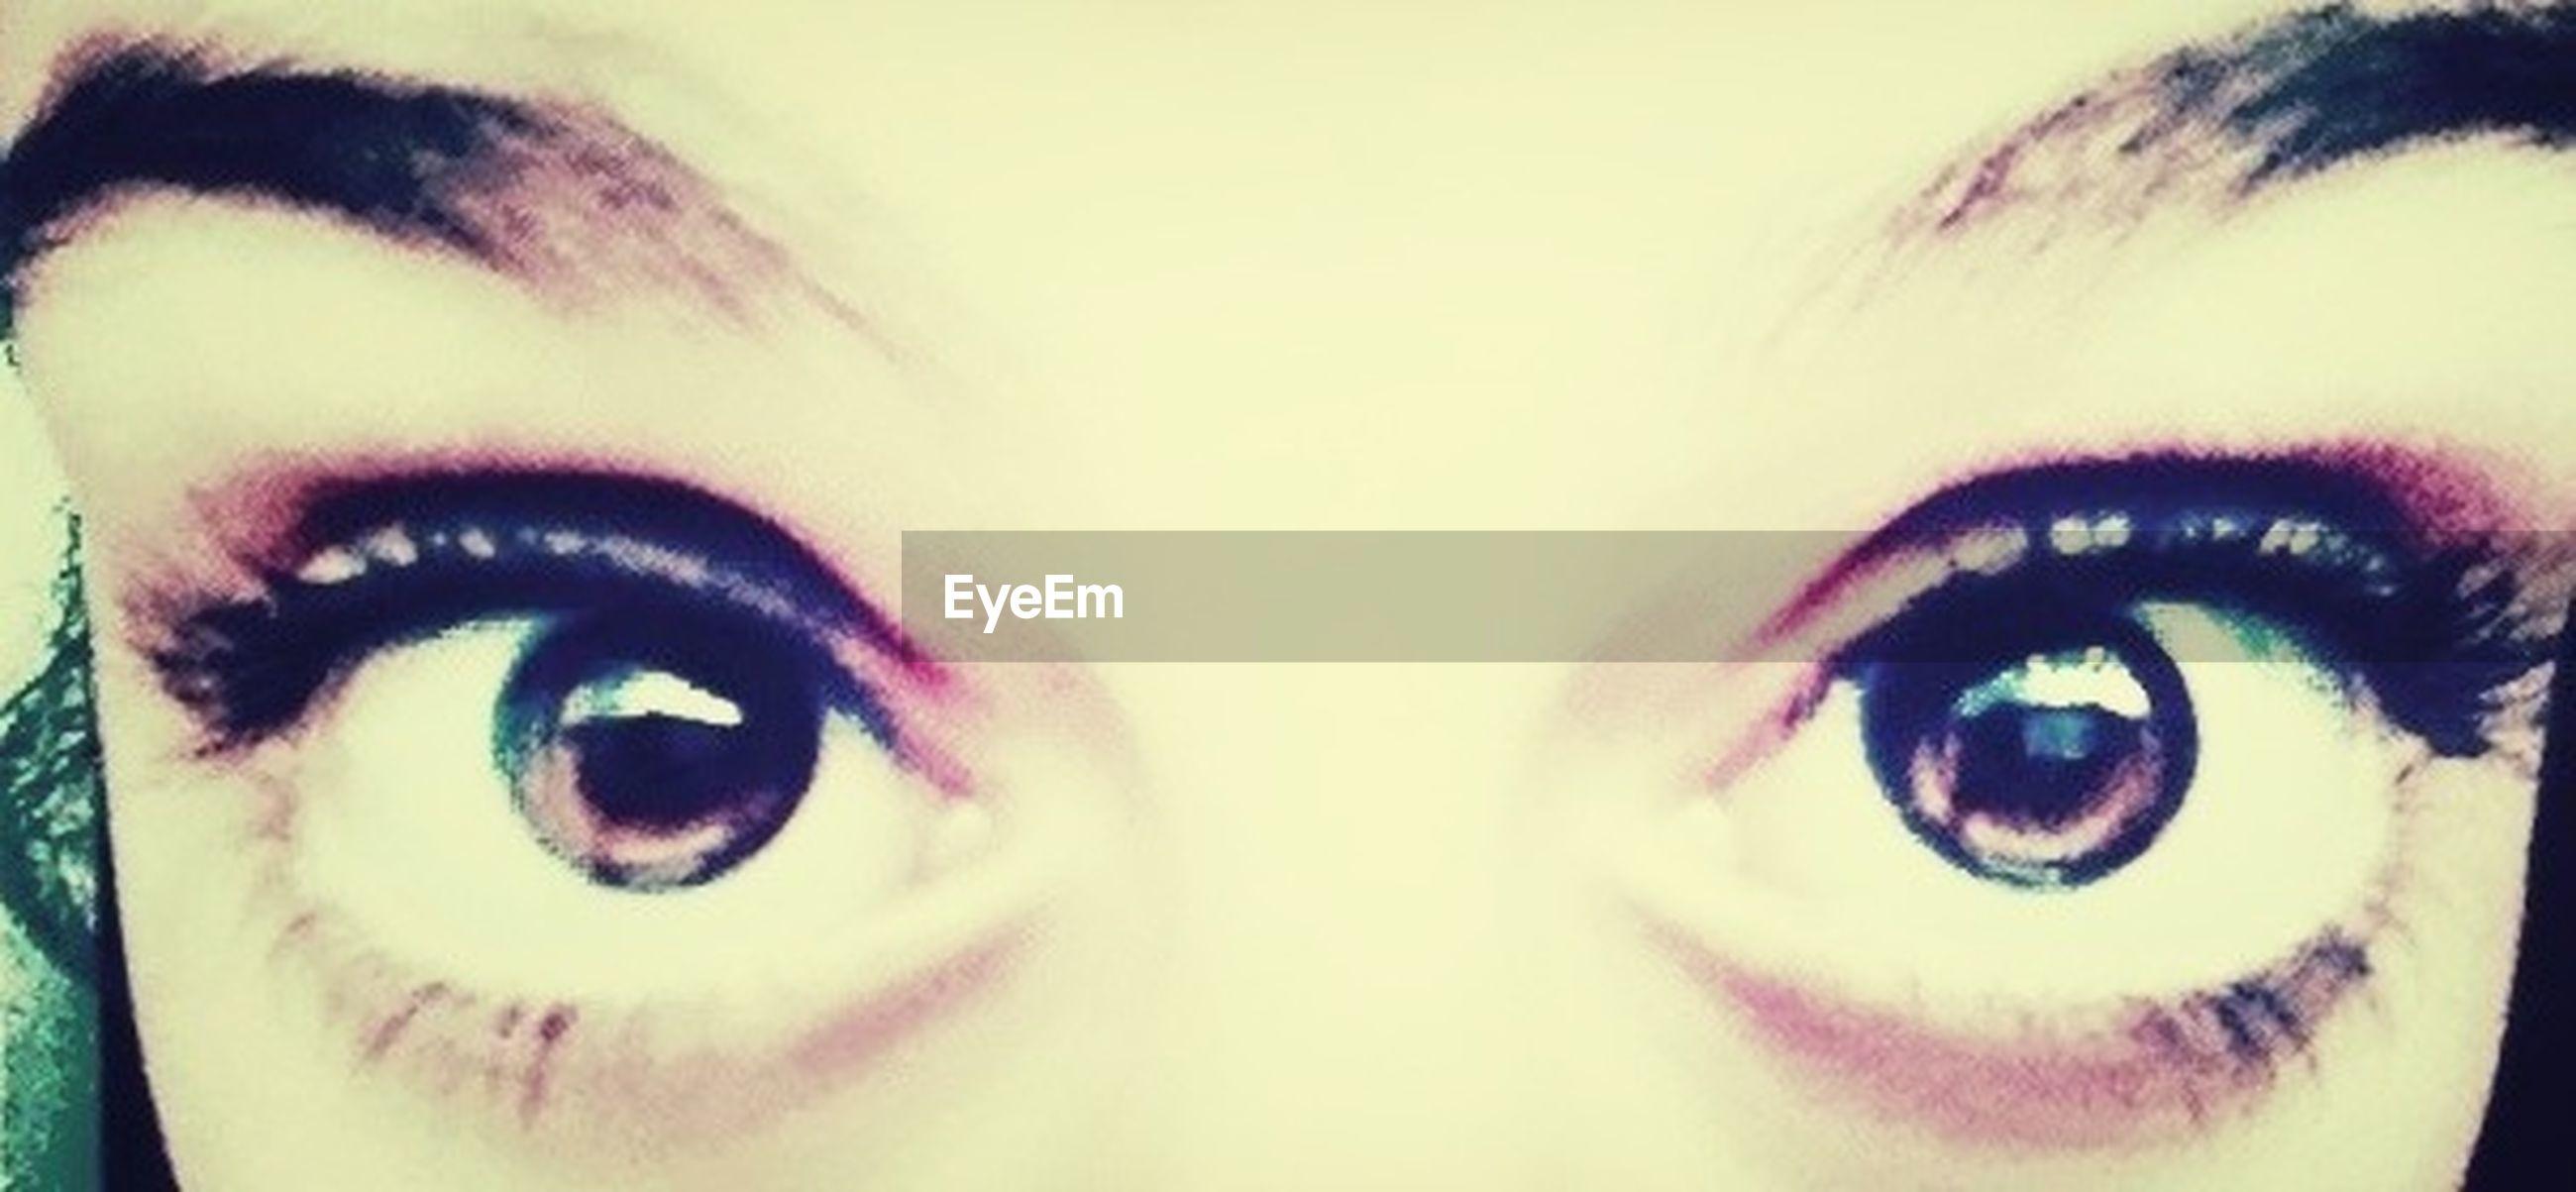 human eye, looking at camera, close-up, headshot, portrait, human face, lifestyles, eyelash, part of, eyesight, person, young adult, front view, leisure activity, sensory perception, blue eyes, indoors